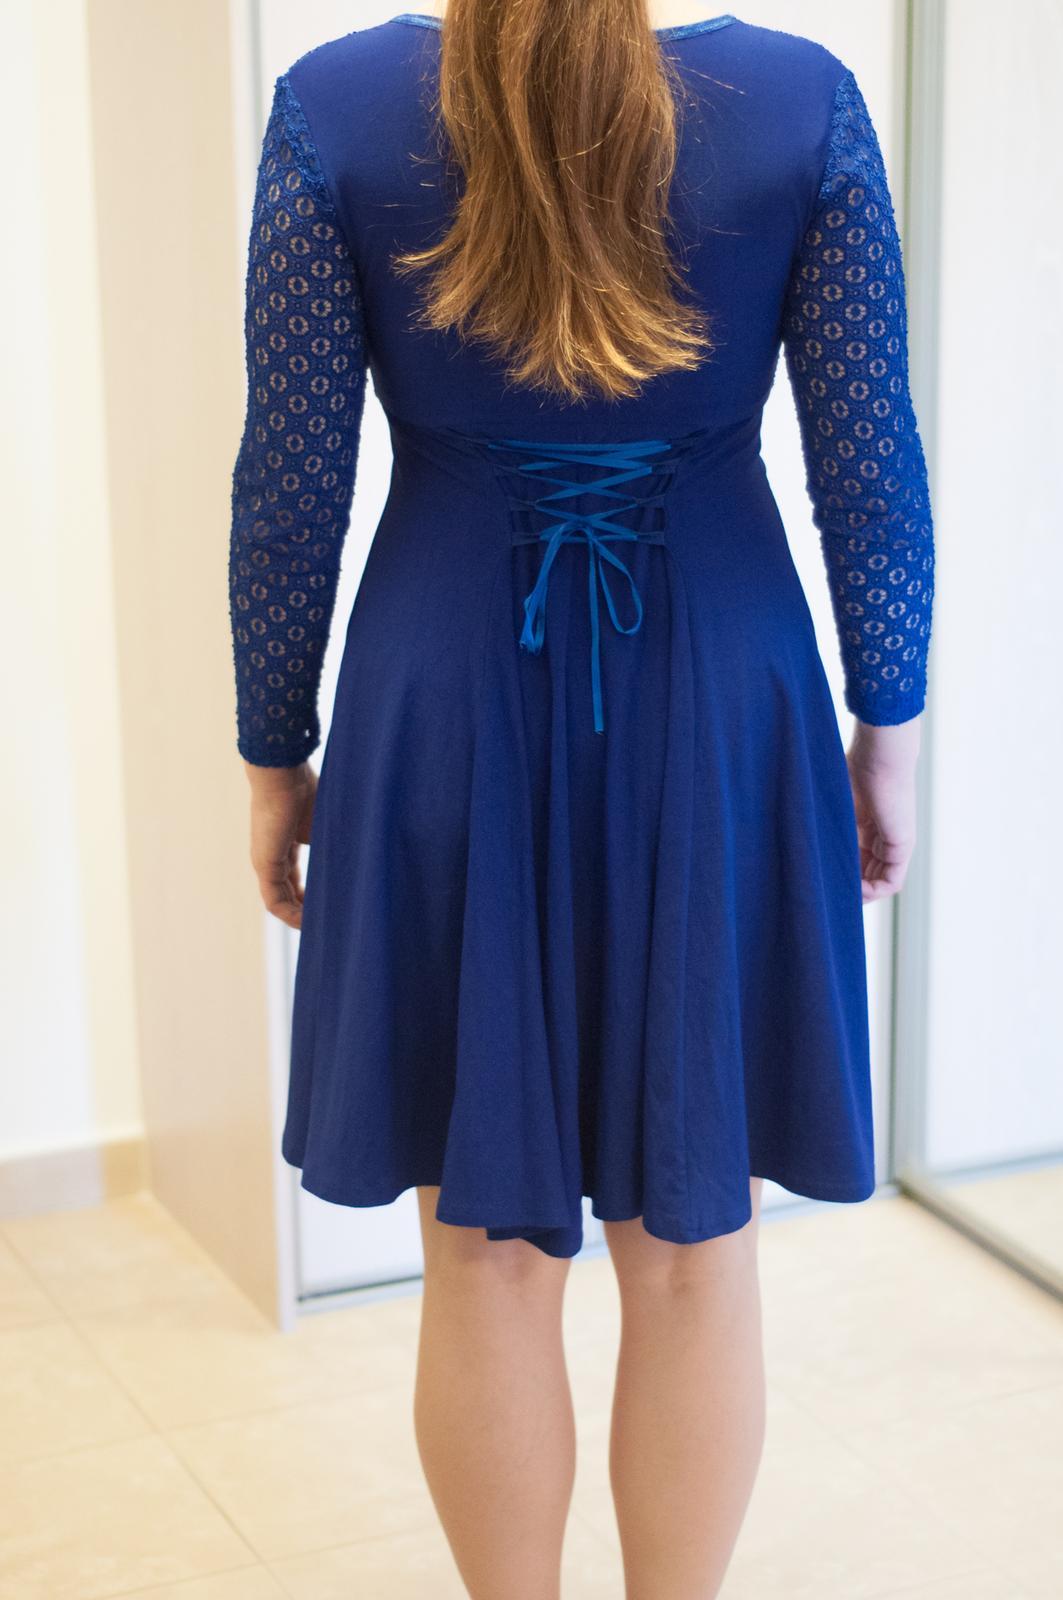 Tmavomodré elastické šaty s čipkou - Obrázok č. 3